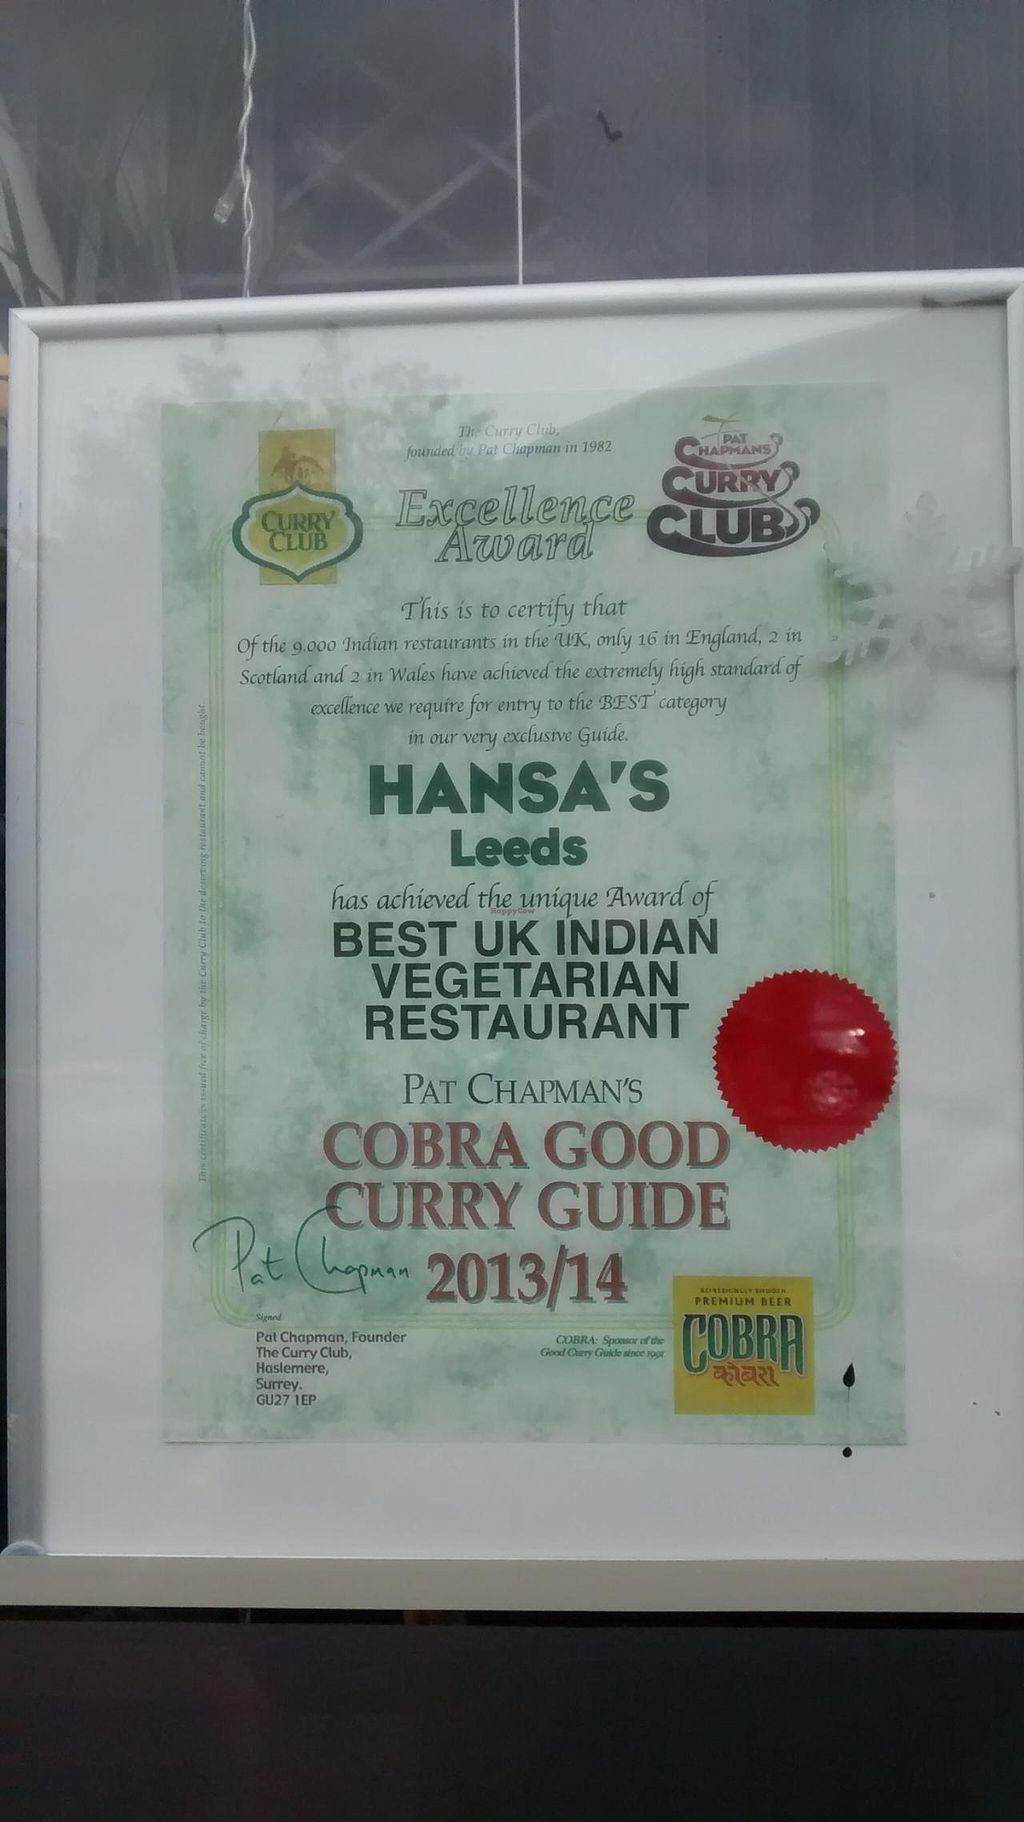 "Photo of Hansa's Restaurant  by <a href=""/members/profile/JonJon"">JonJon</a> <br/>Hansa's best restaurant award <br/> September 22, 2014  - <a href='/contact/abuse/image/776/80726'>Report</a>"